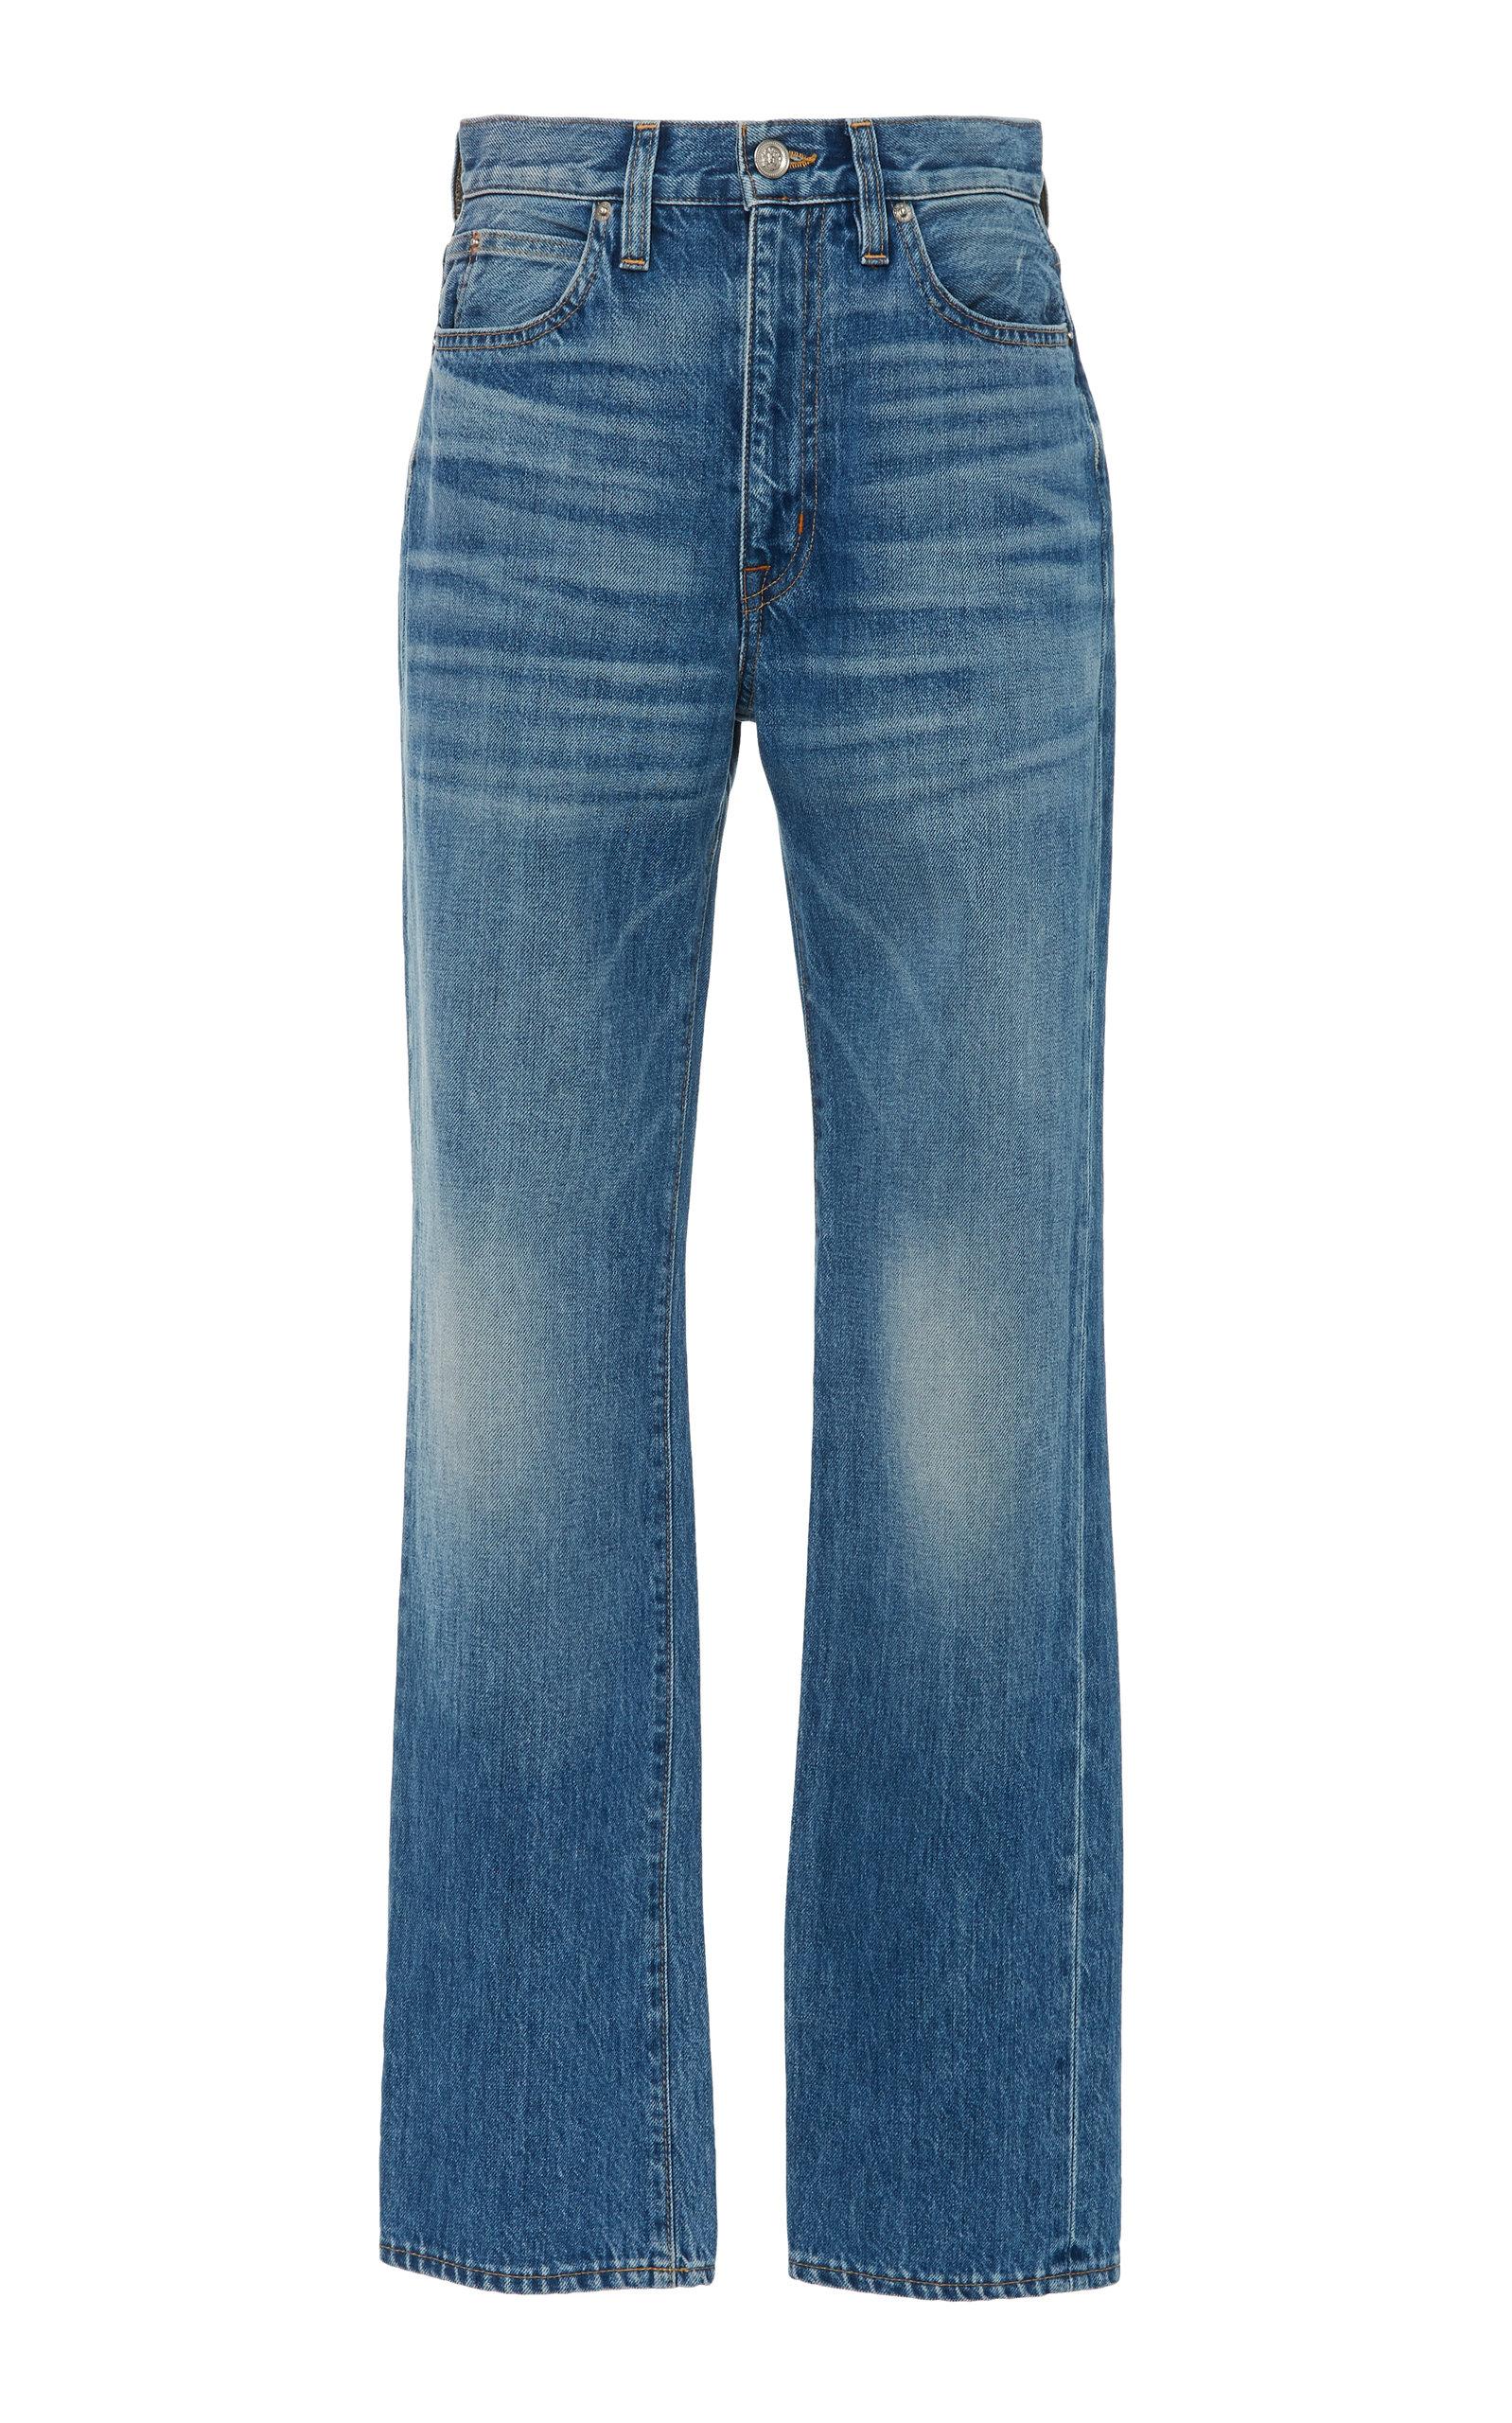 59cbadd3dfc42a London High-Waisted Straight-Leg Jeans by SLVRLAKE Denim   Moda Operandi